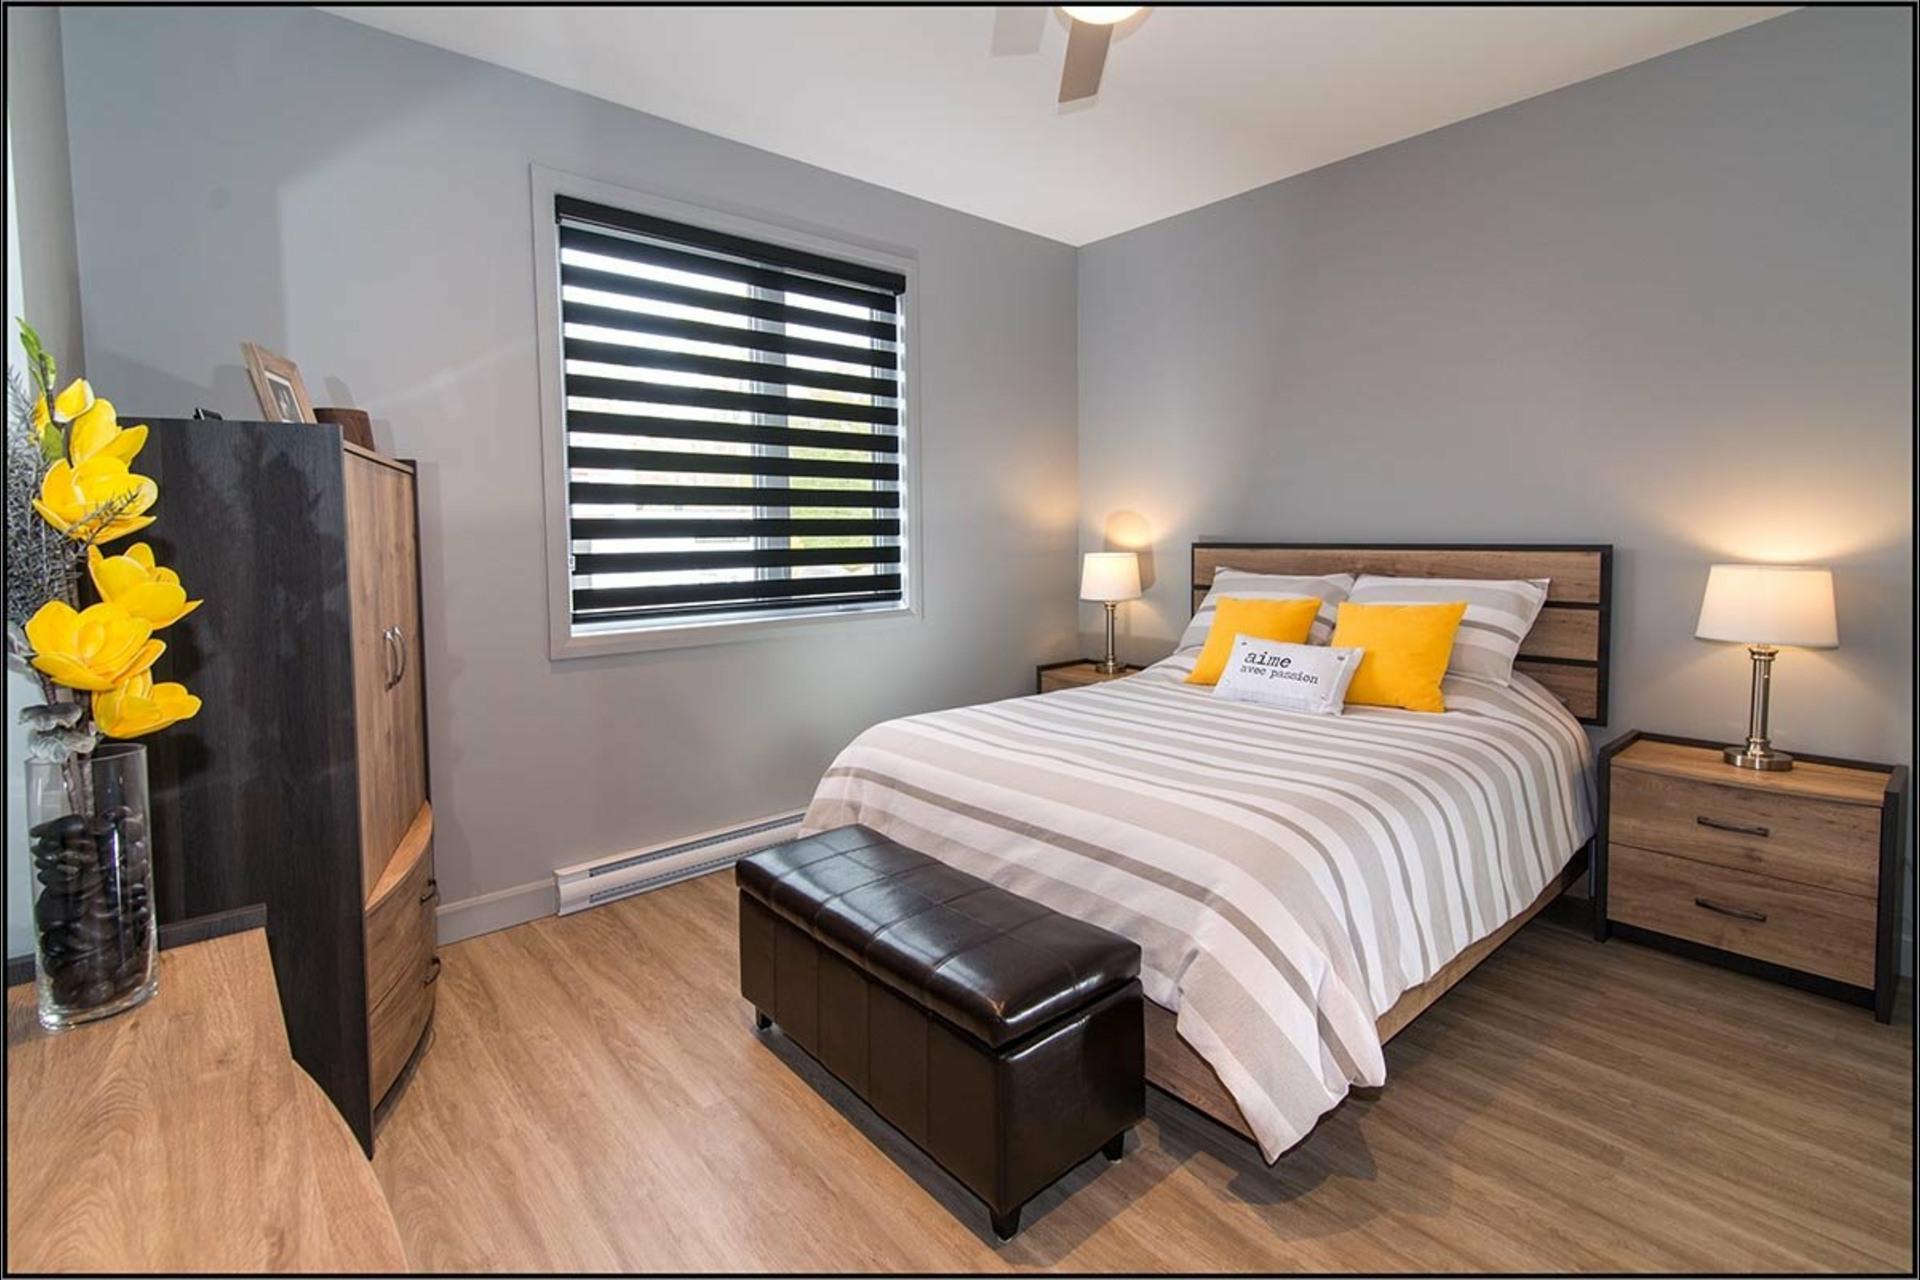 image 6 - Apartment For sale Sainte-Marie - 9 rooms